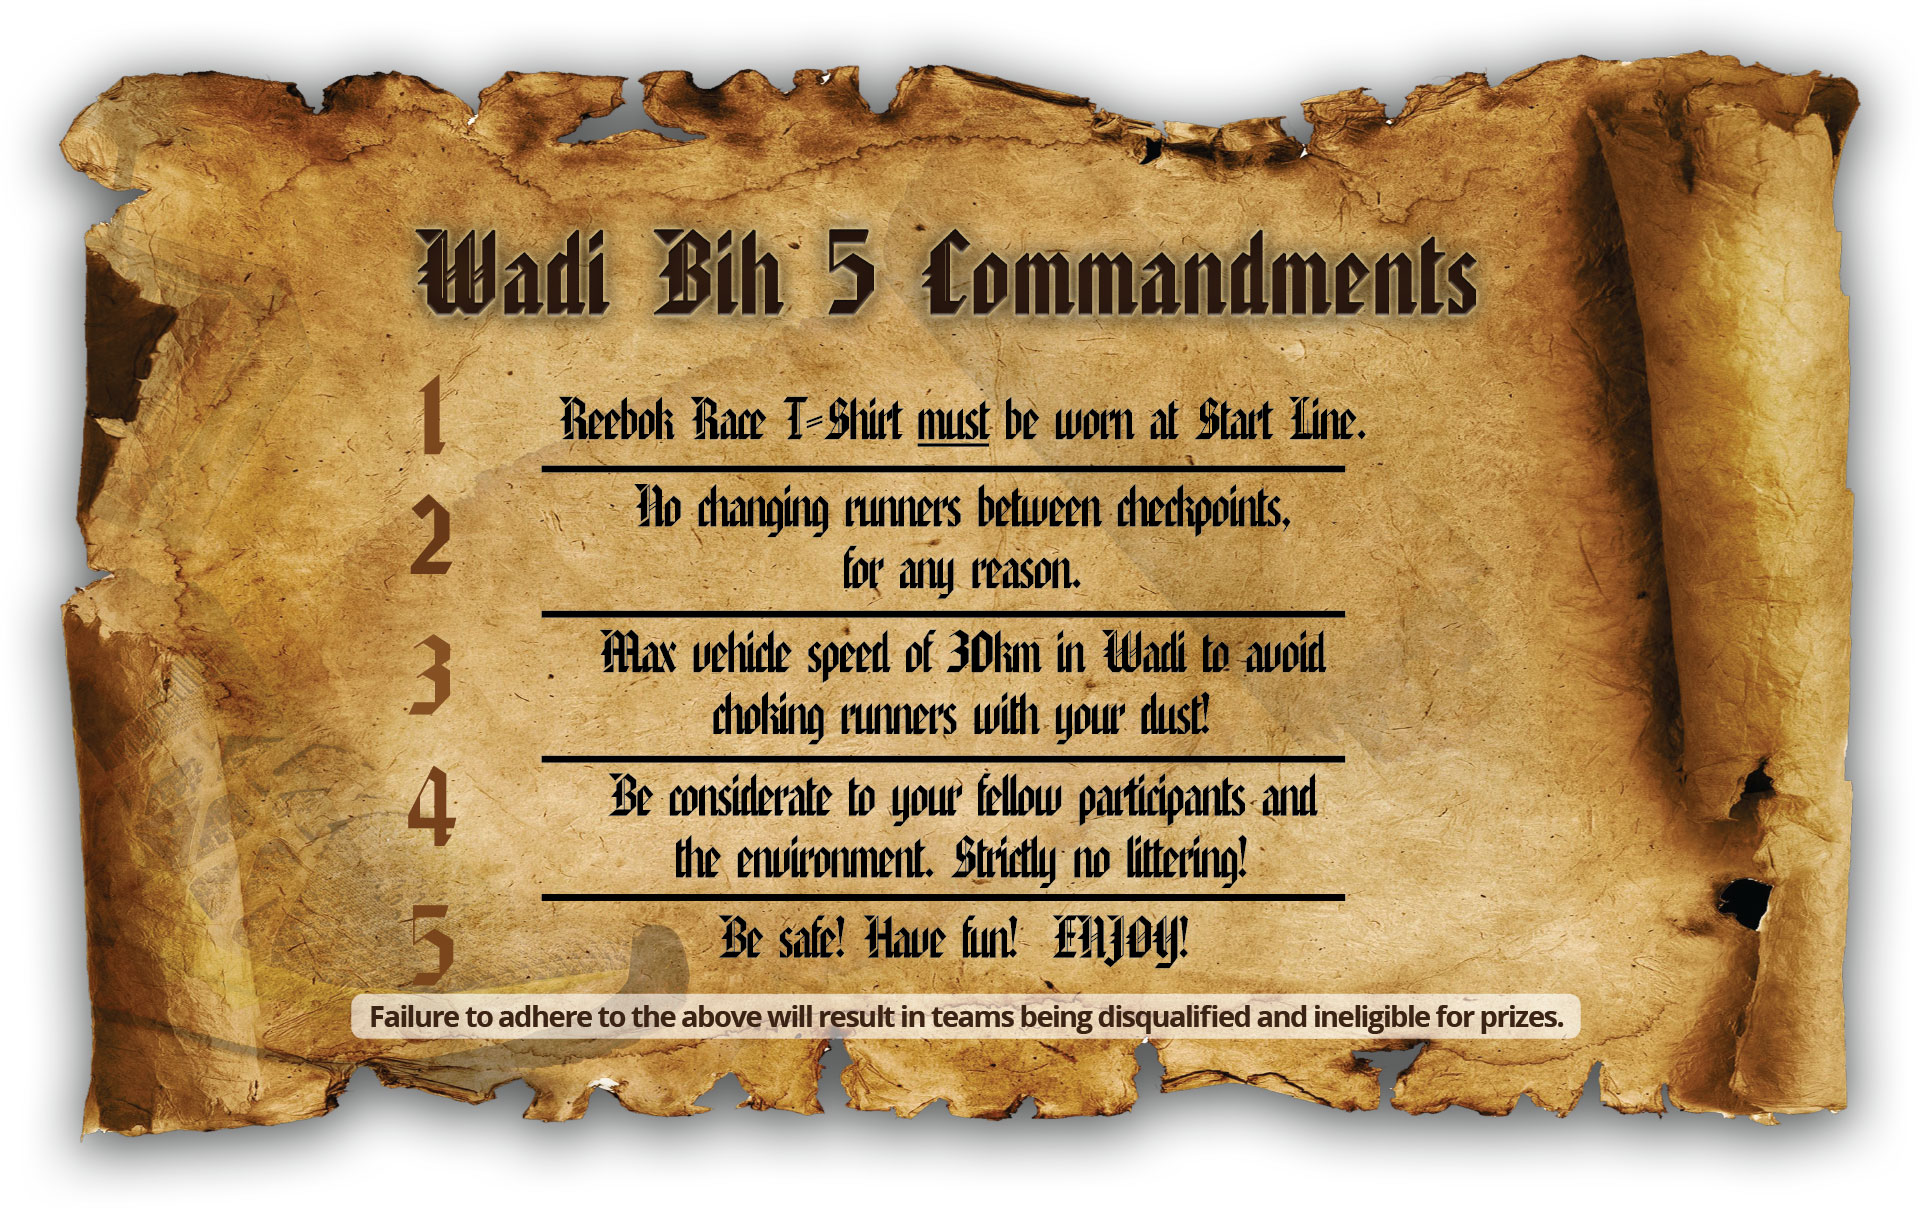 5 commandment of wadih bih run